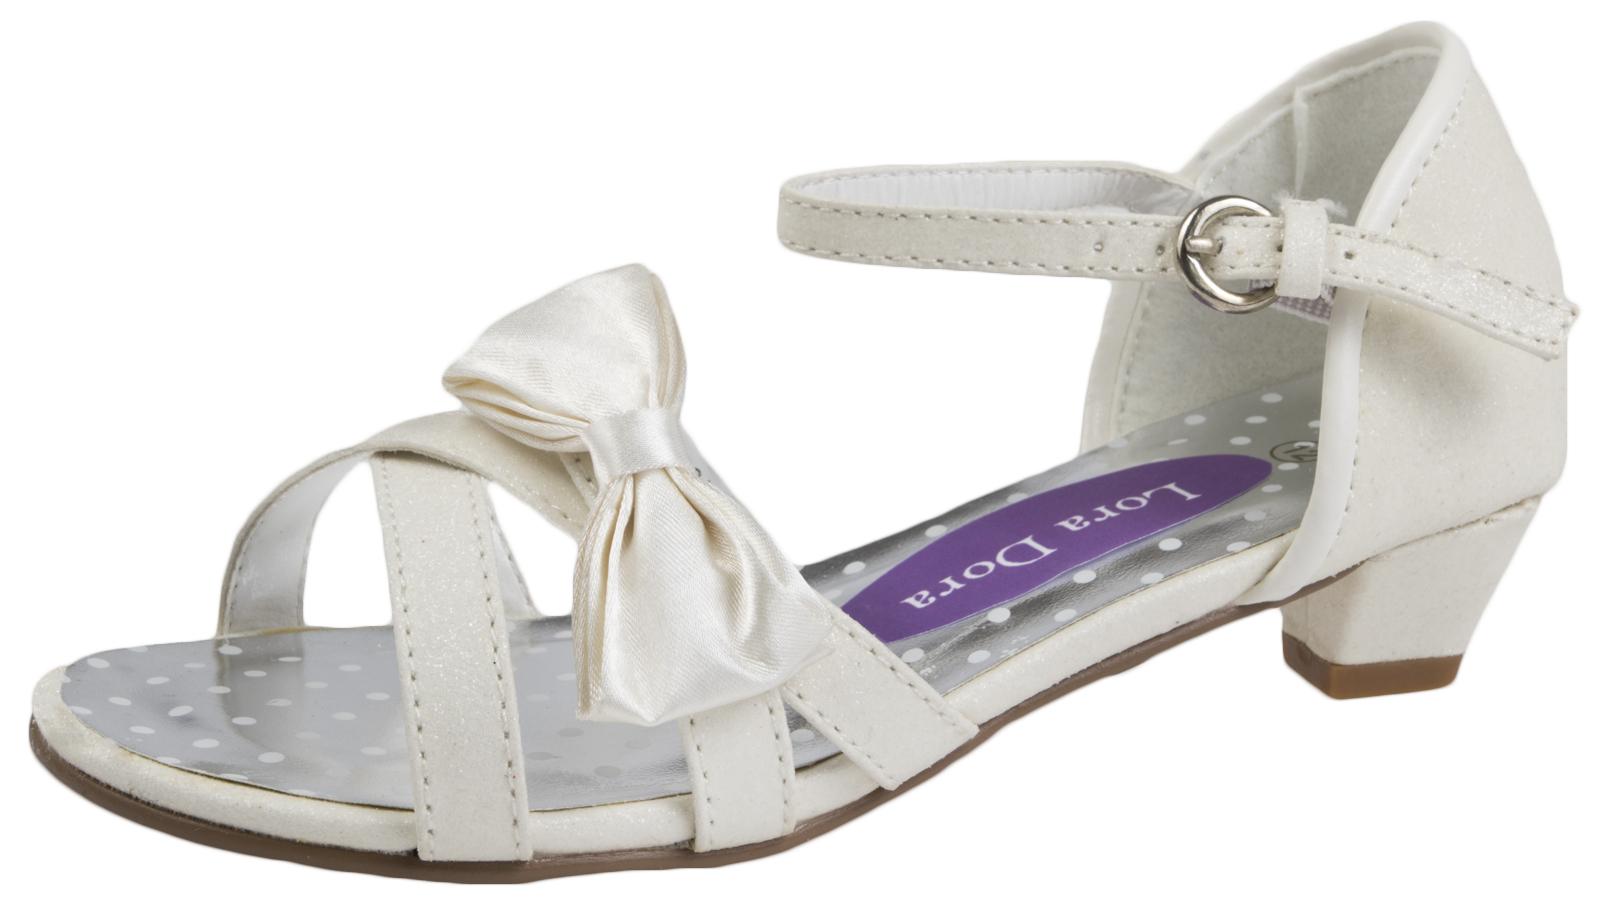 Kids High Heels Formal Wedding Shoes Open Toe Party